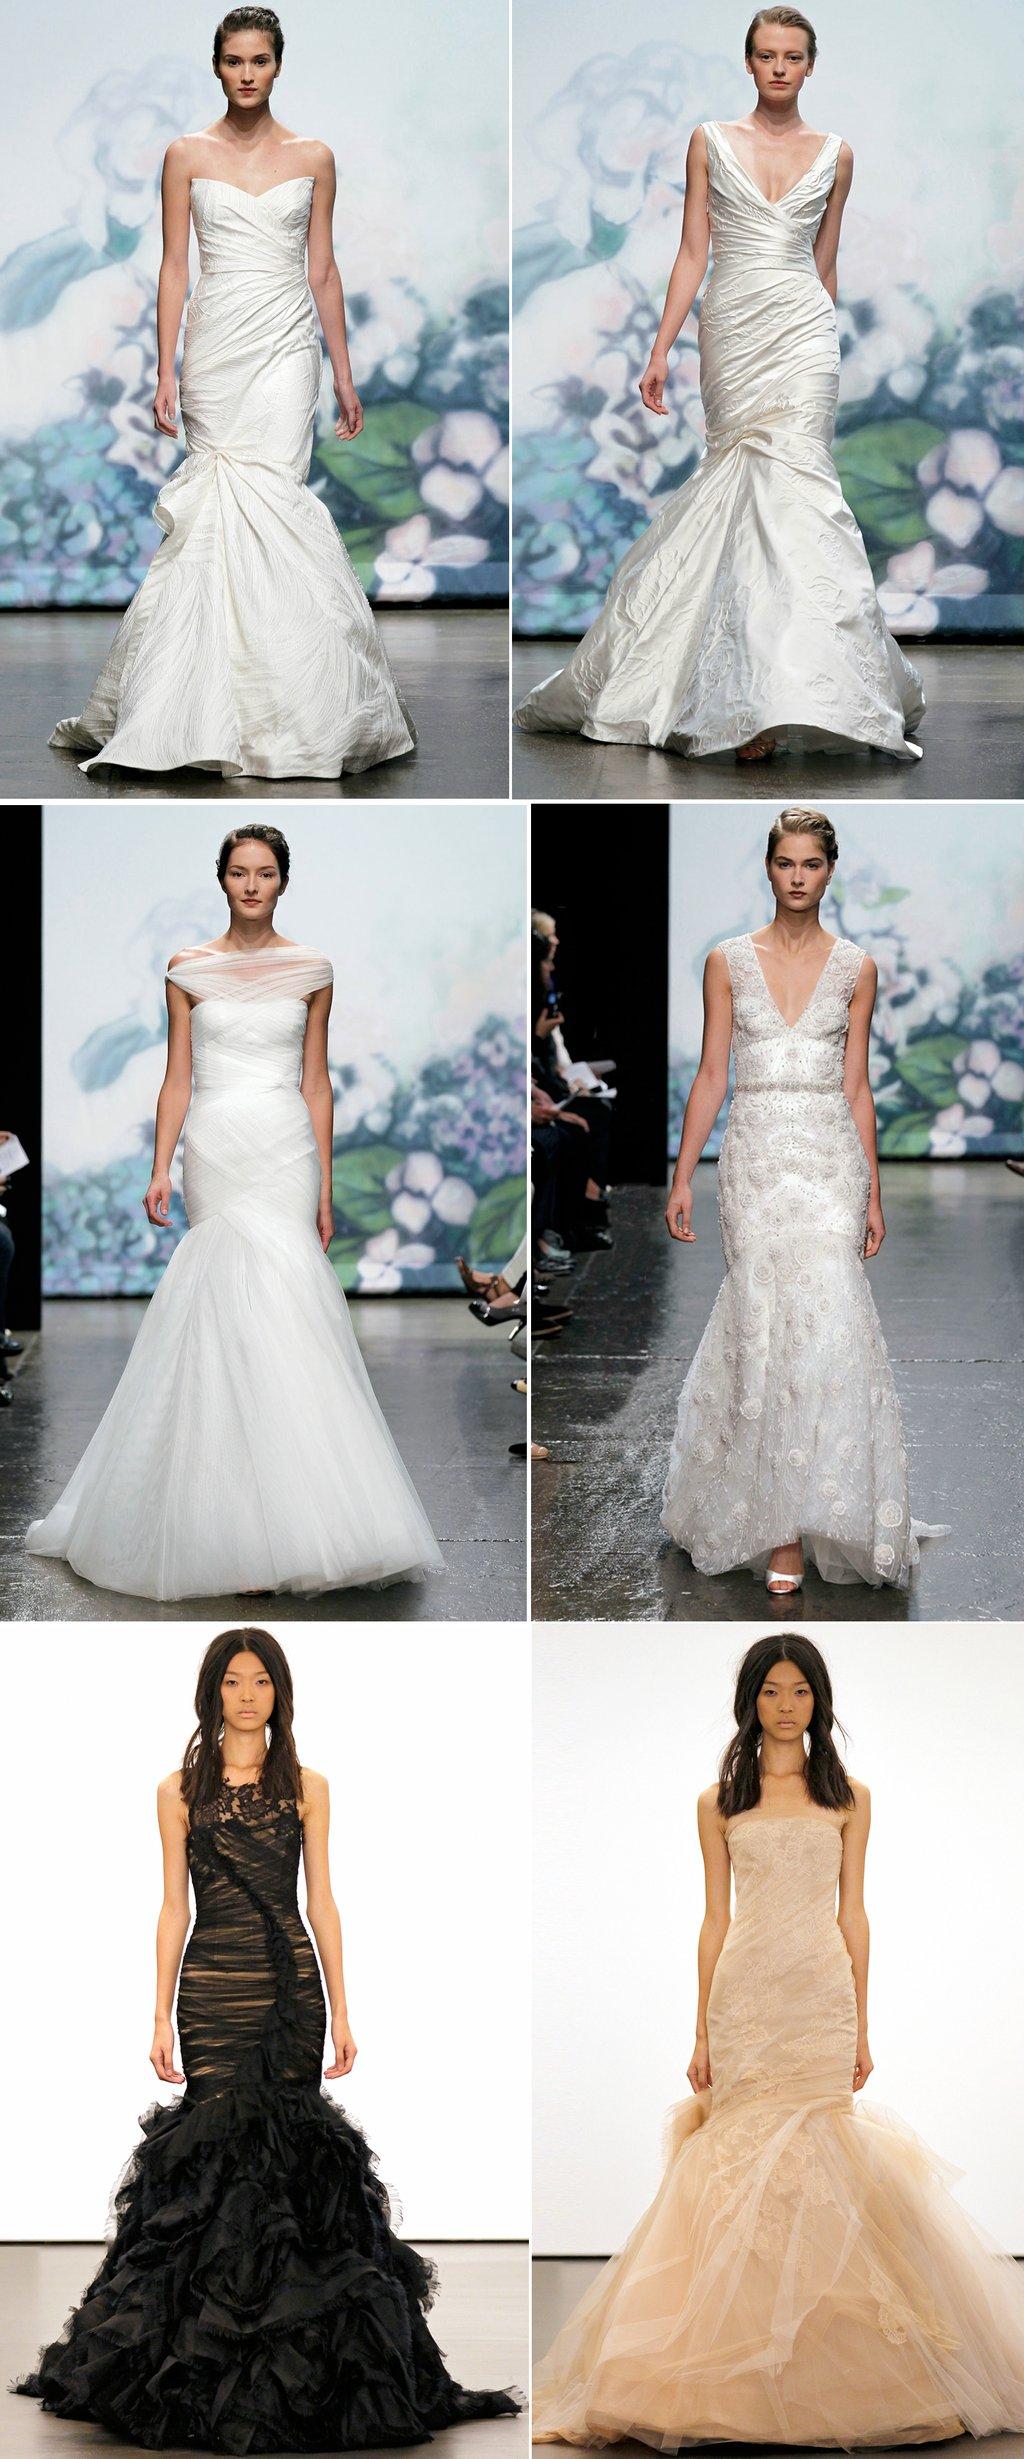 2012-wedding-dresses-mermaid-bridal-gown-vera-wang-monique-lhuillier.full